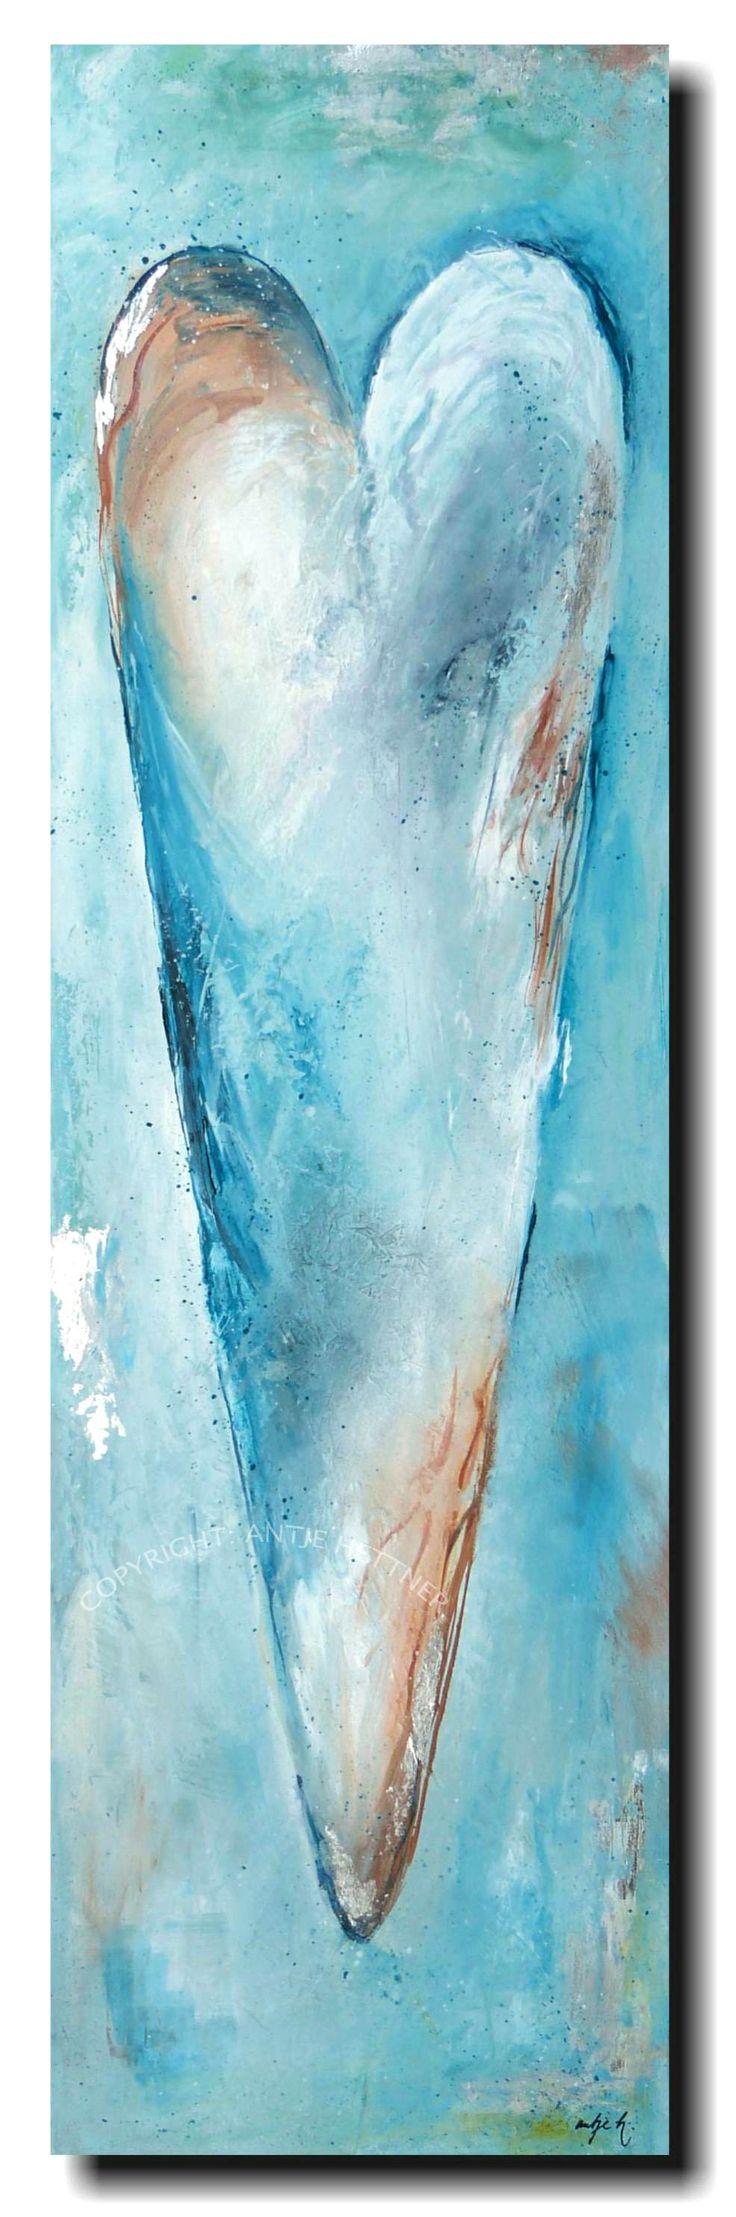 """aquamarin herz"" acrylic on canvas"